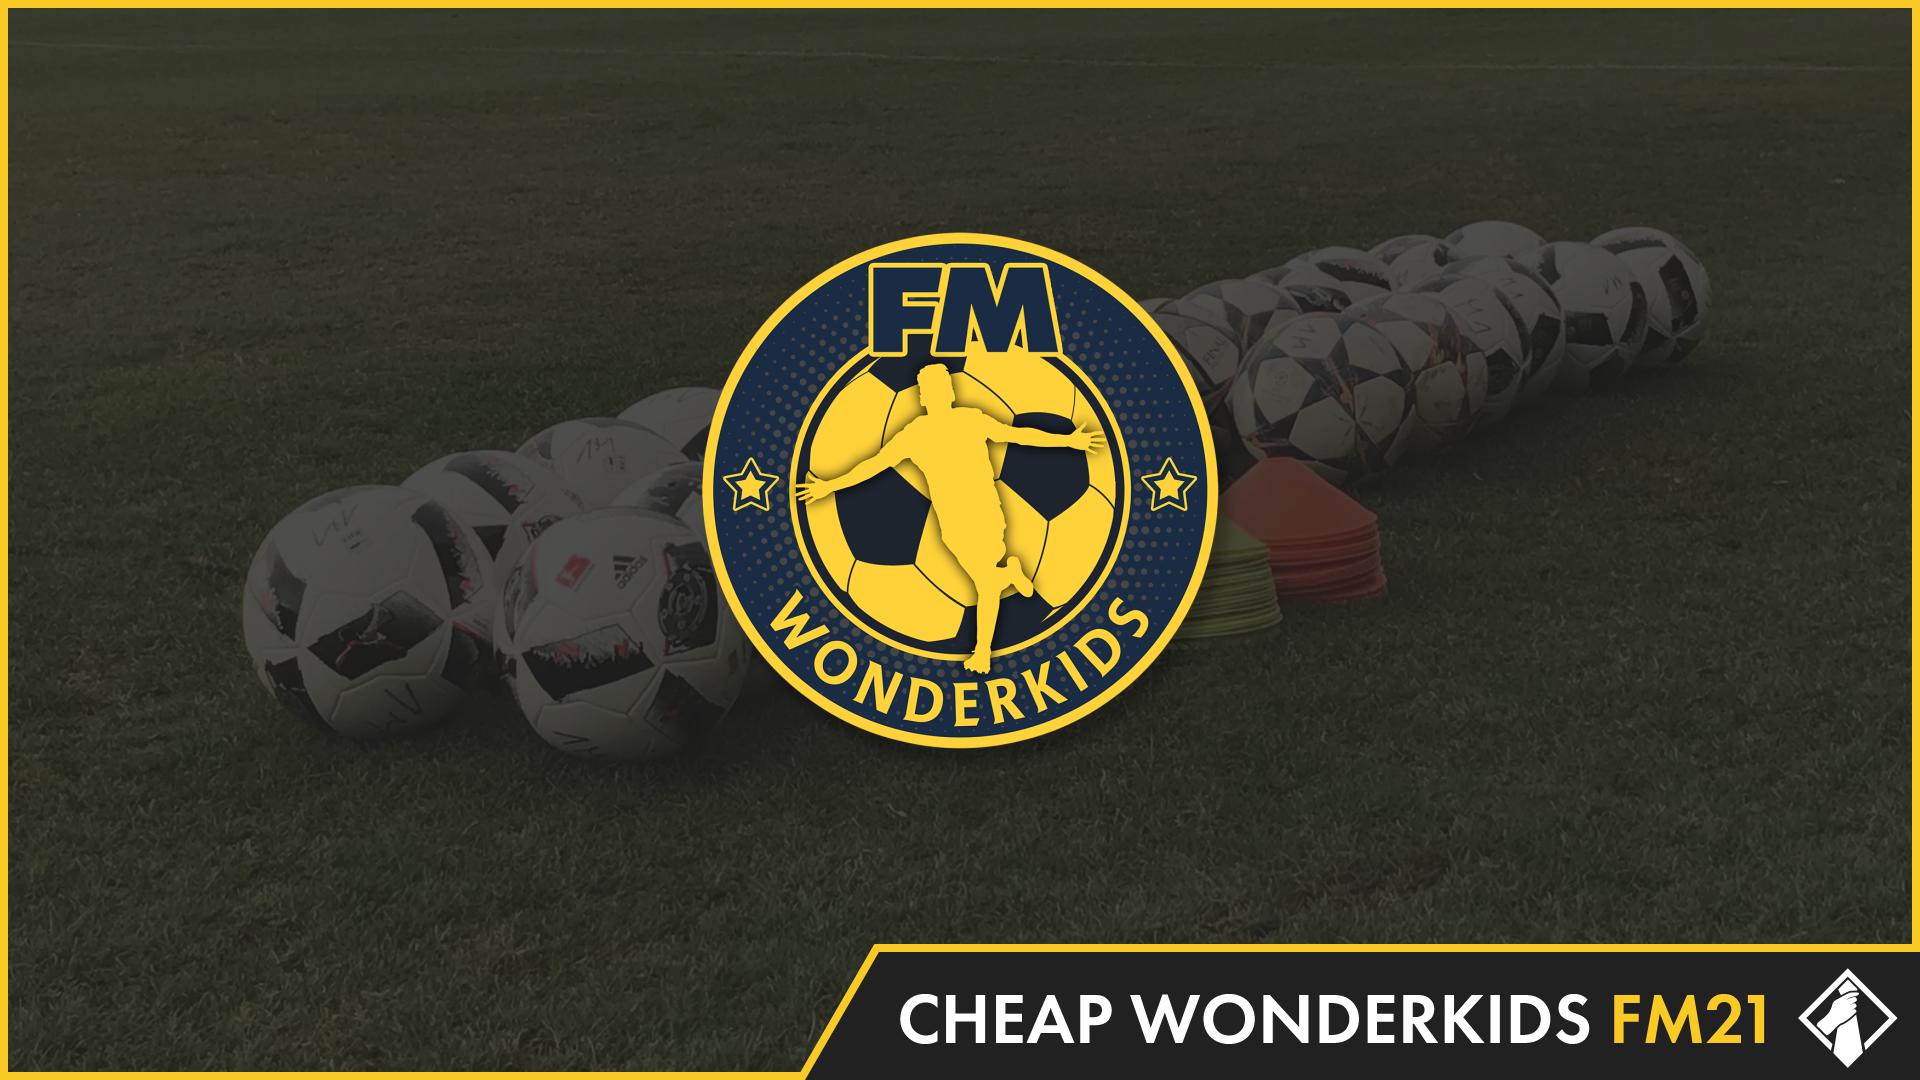 """FM21: Cheap Wonderkids by FM Wonderkids"" feature image"